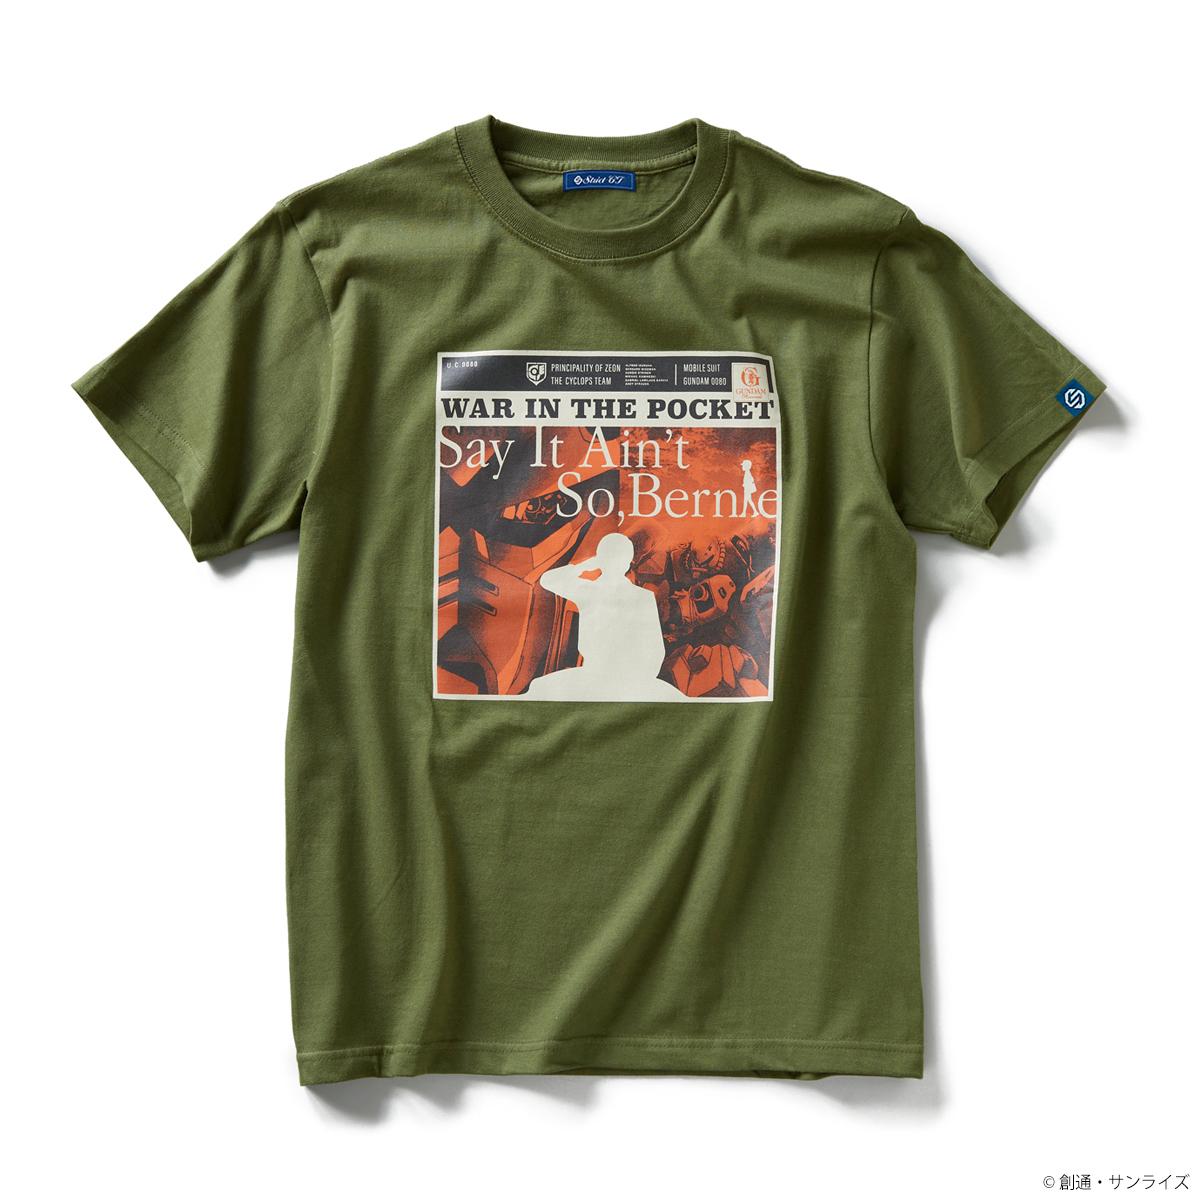 STRICT-G GUNDAM RECORDS 『機動戦士ガンダム 0080ポケットの中の戦争』Tシャツ